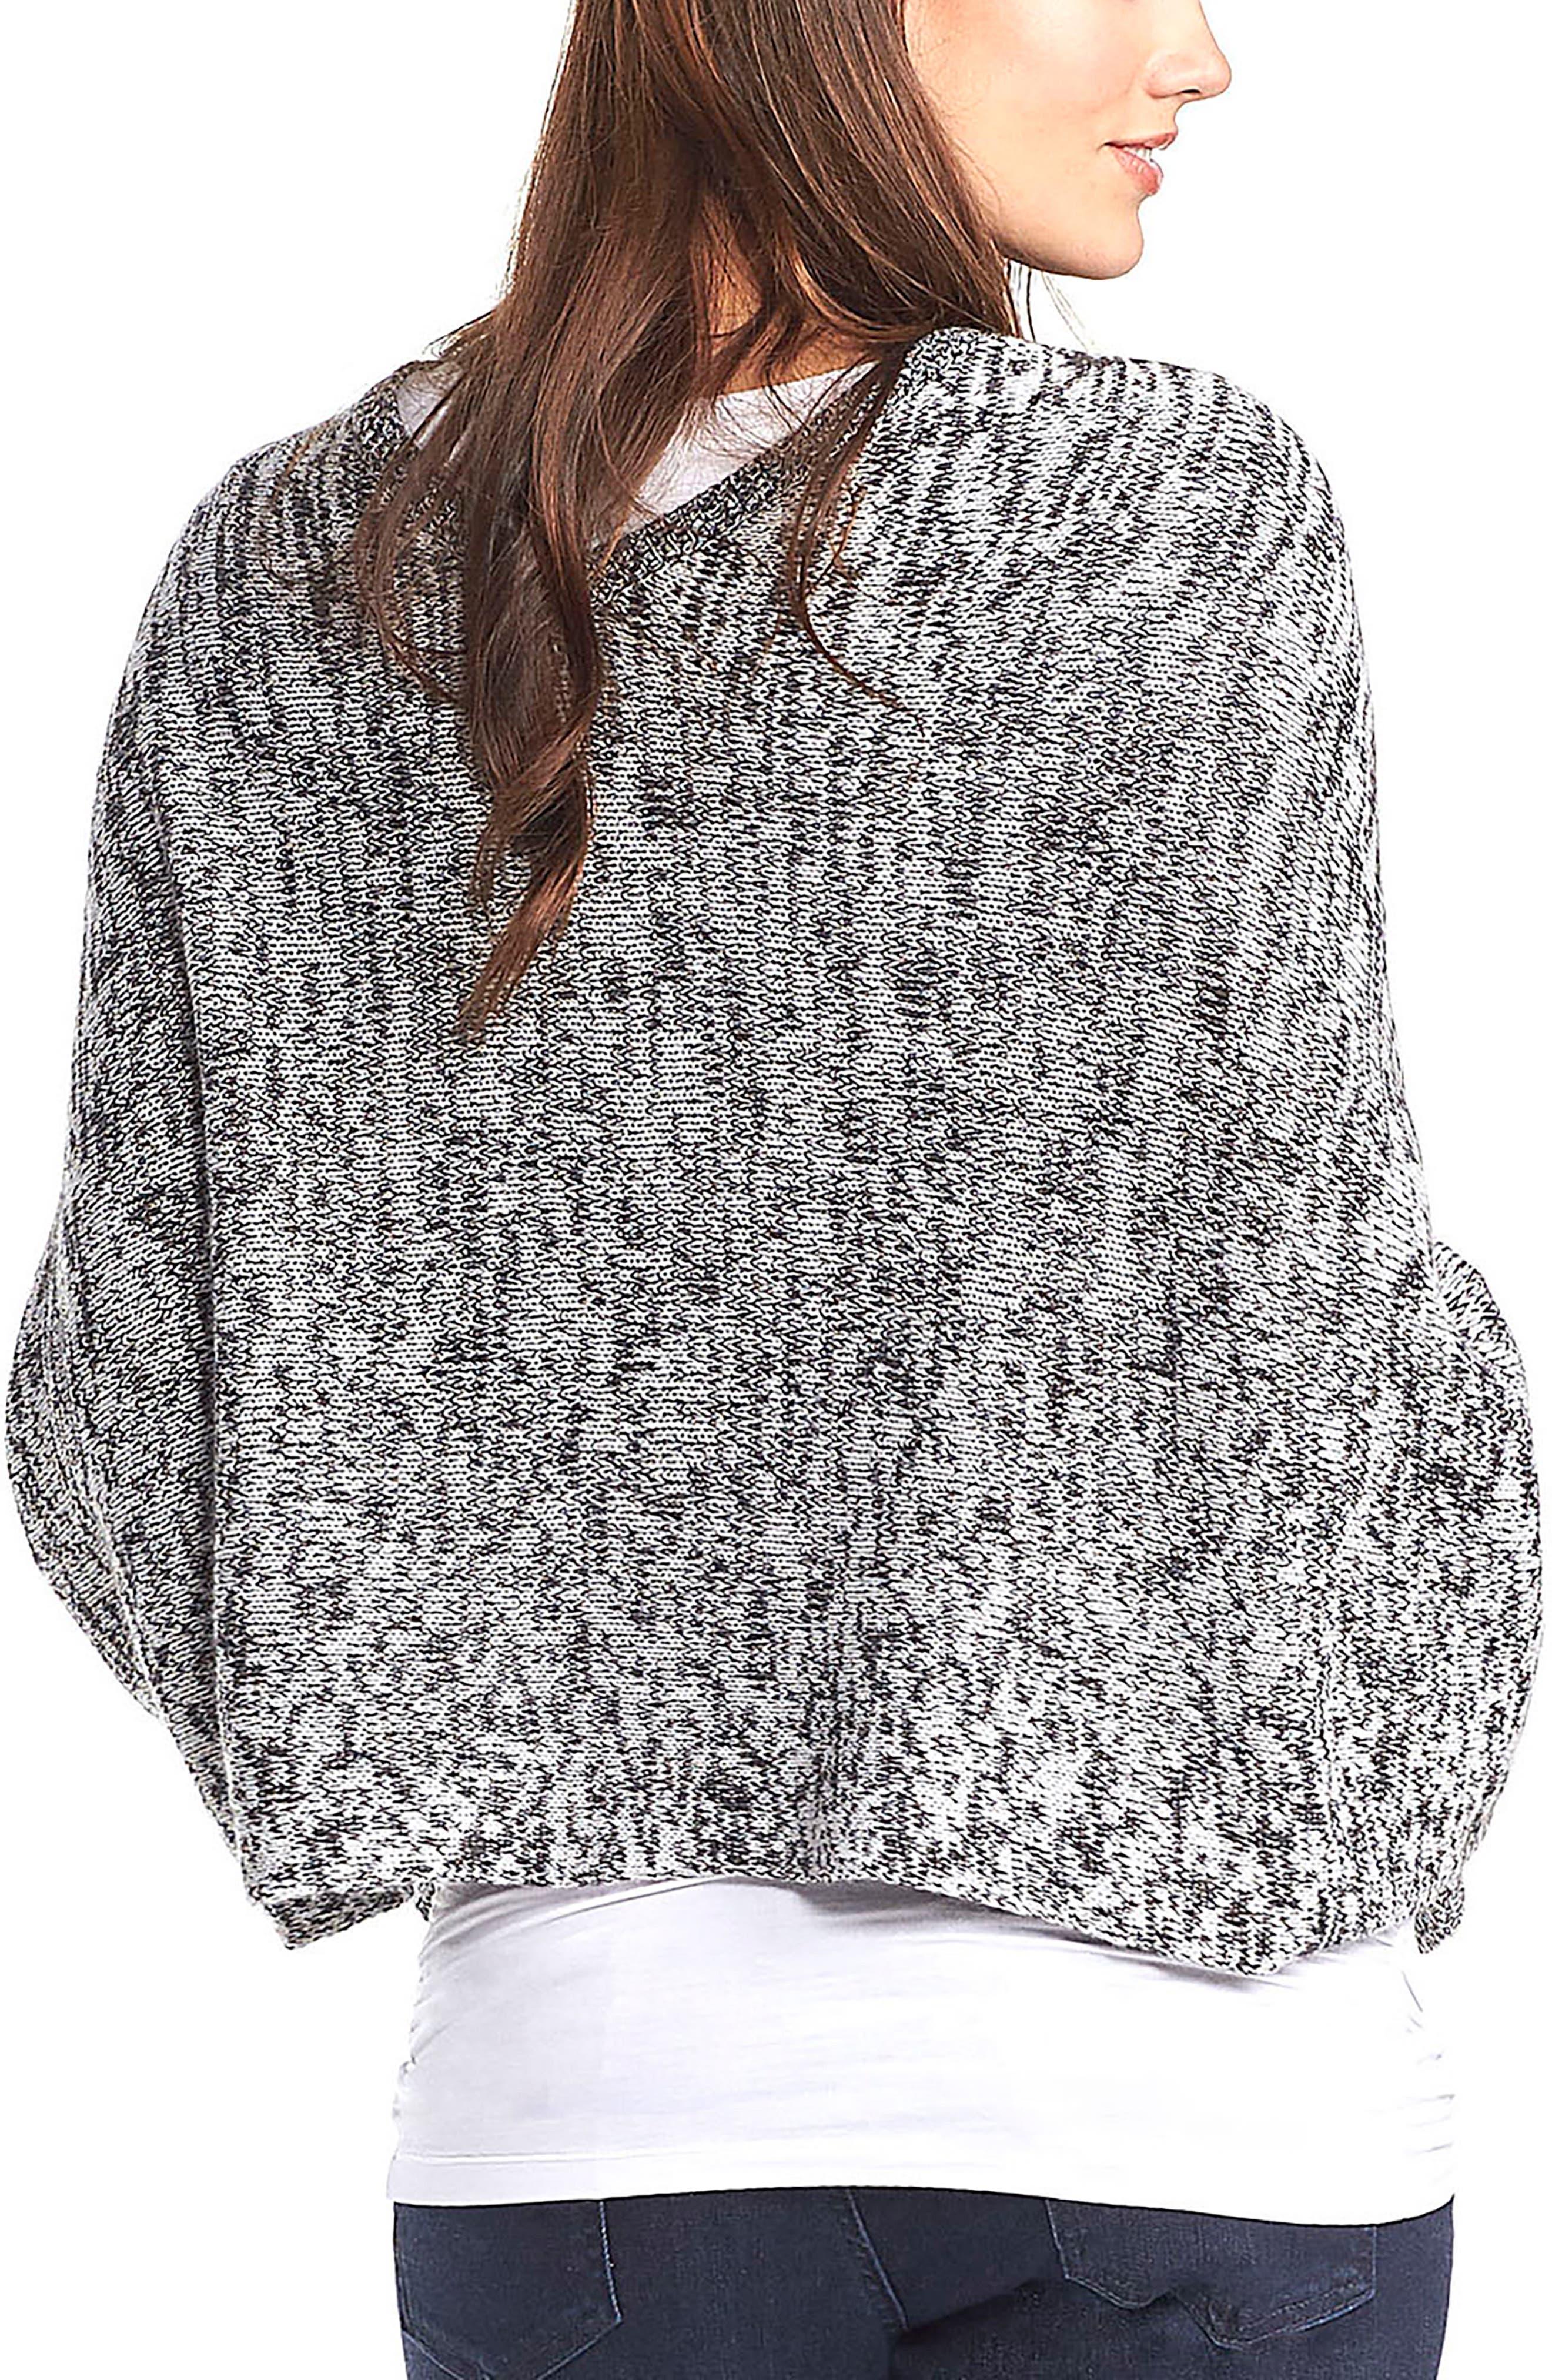 'Alana' Wool Maternity Poncho,                             Alternate thumbnail 2, color,                             BLACK/WHITE